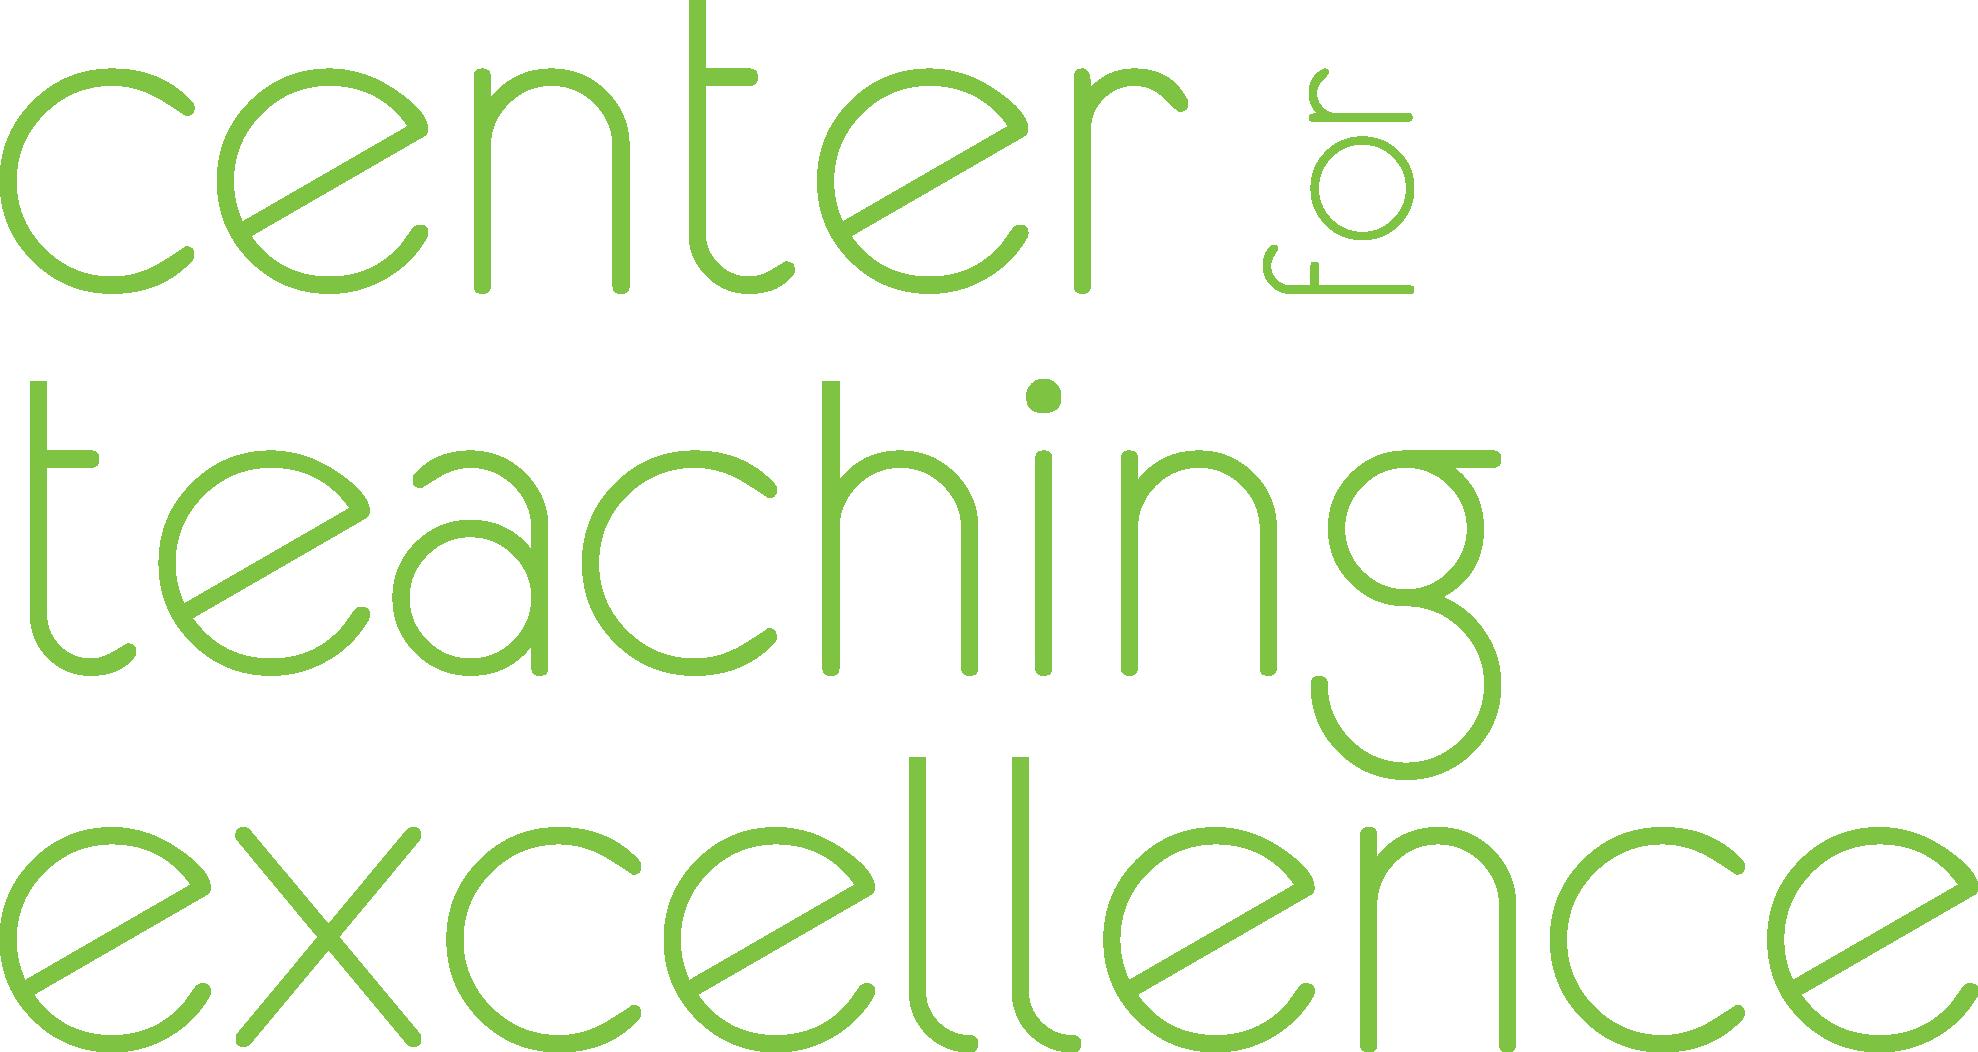 Lee University Center for Teaching Excellence